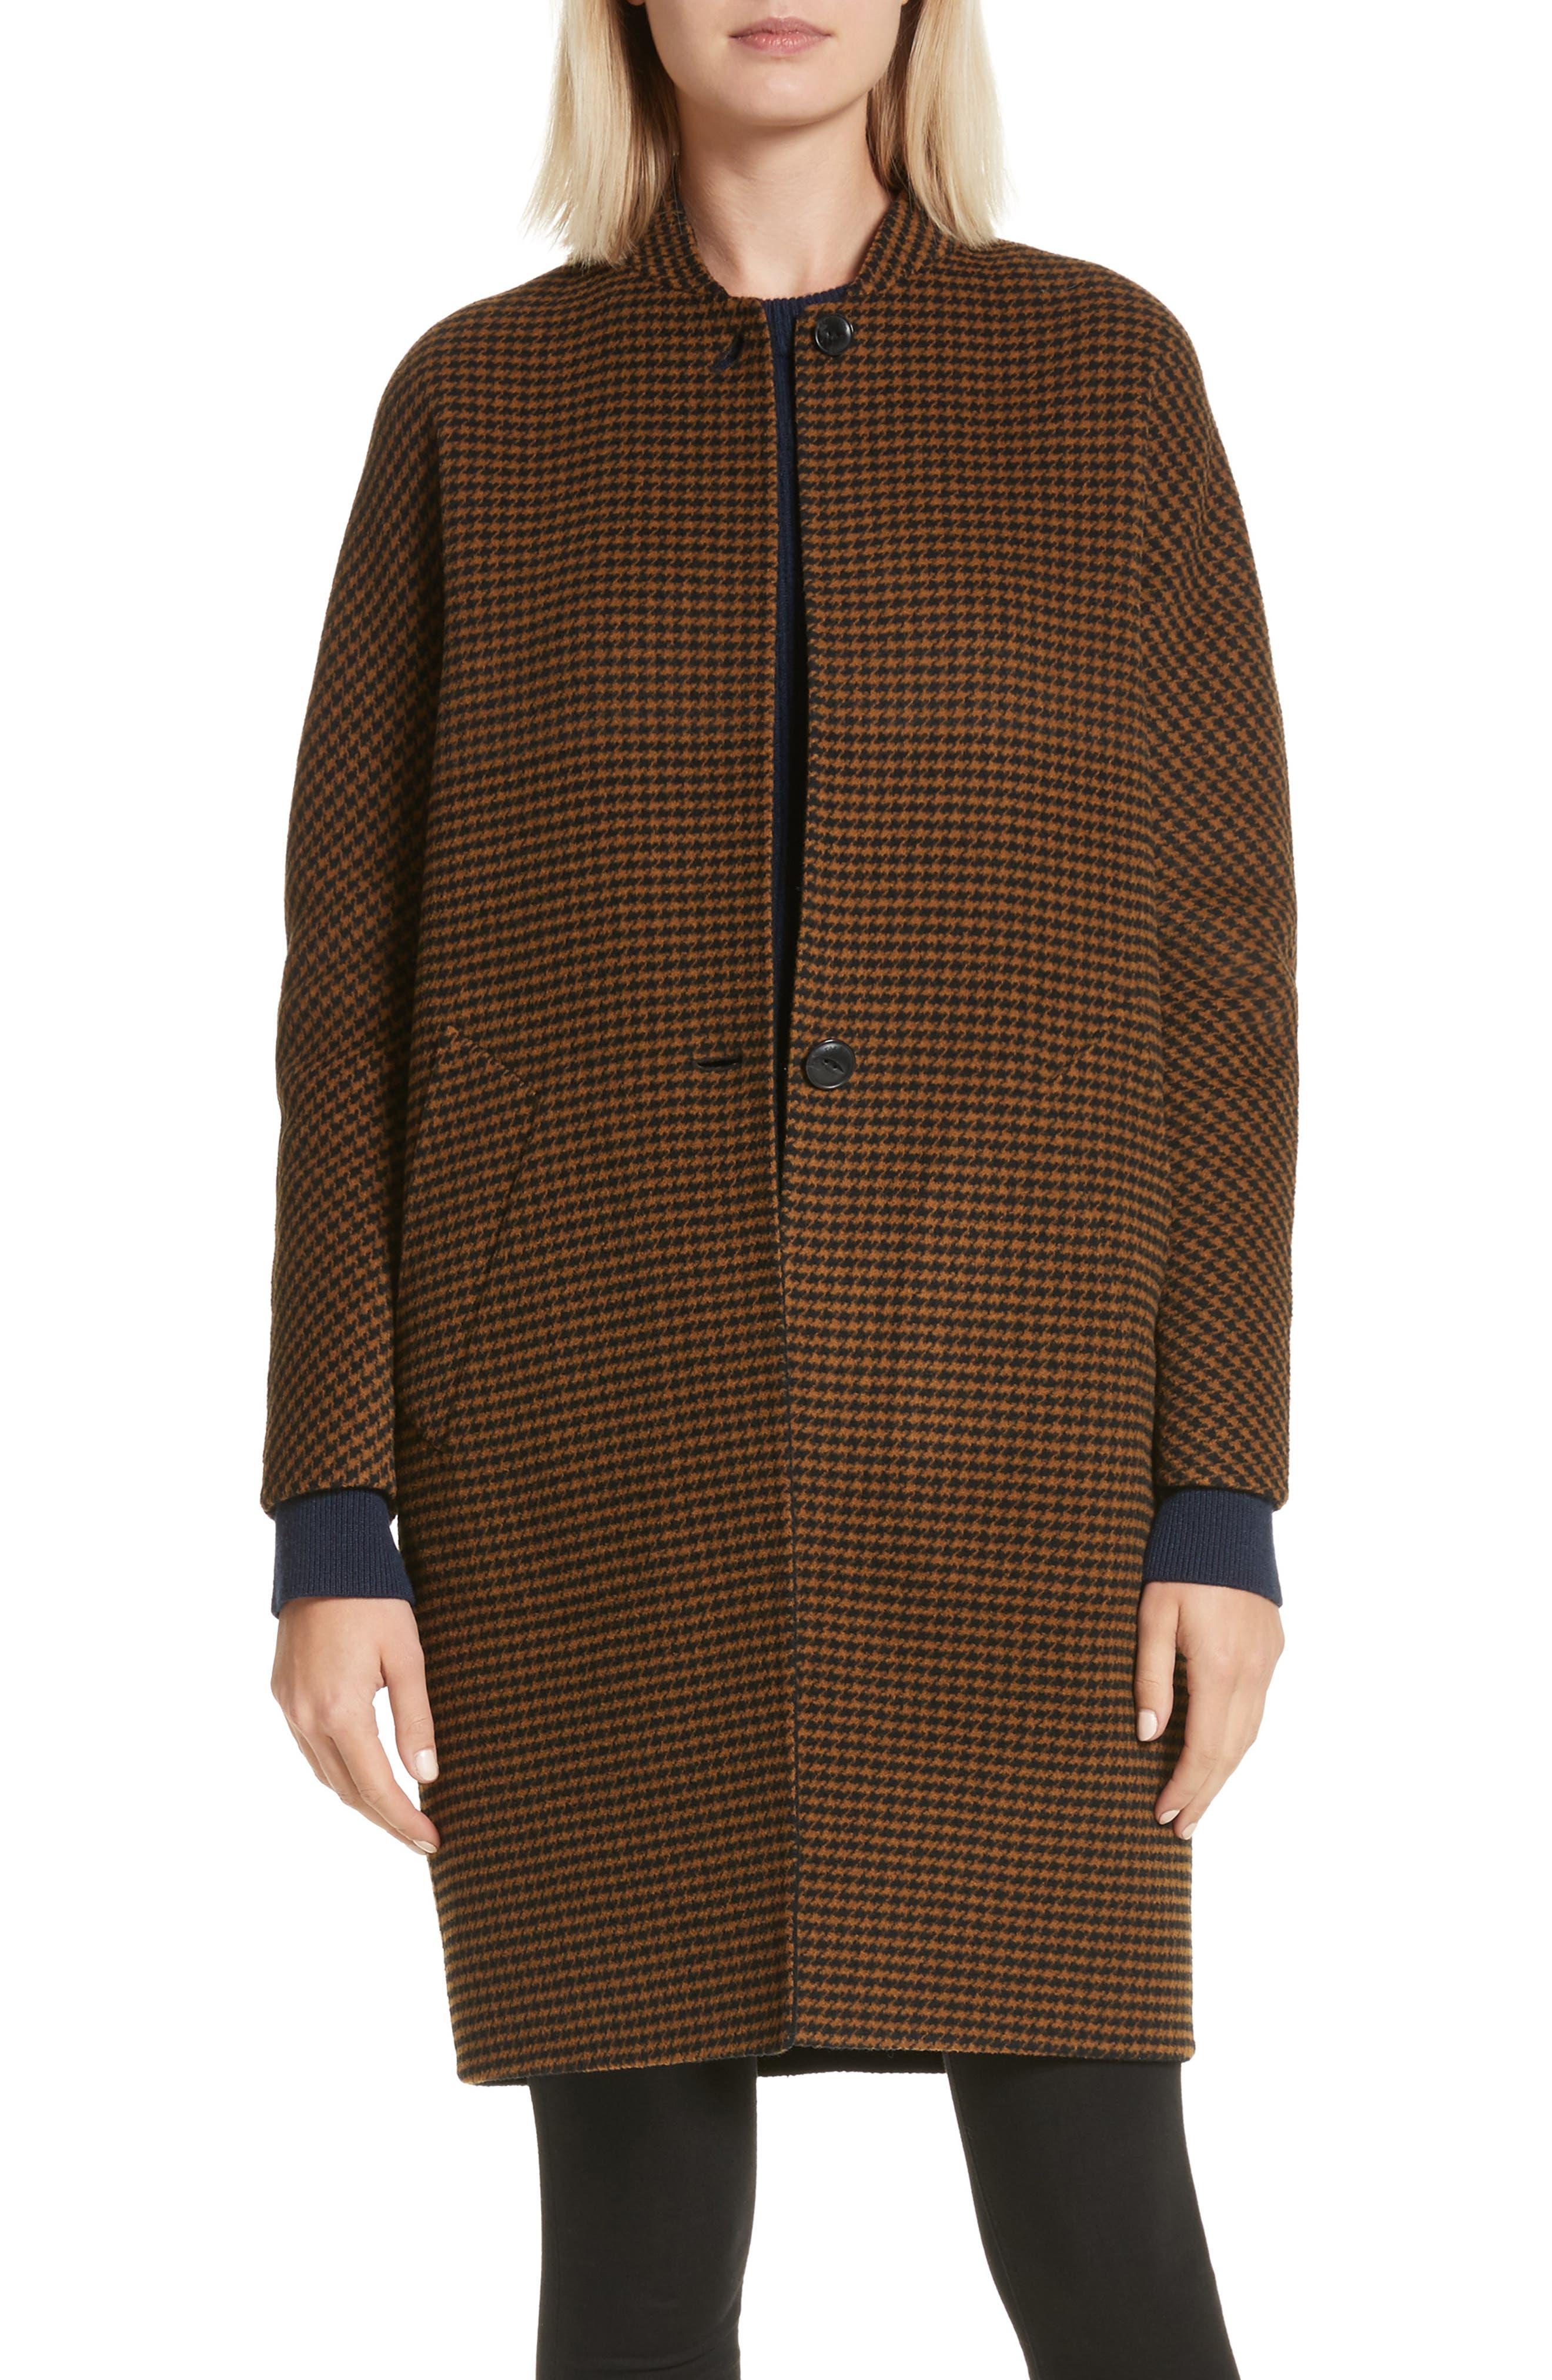 Darwen Reversible Wool & Cashmere Coat,                             Main thumbnail 1, color,                             Brown/Black